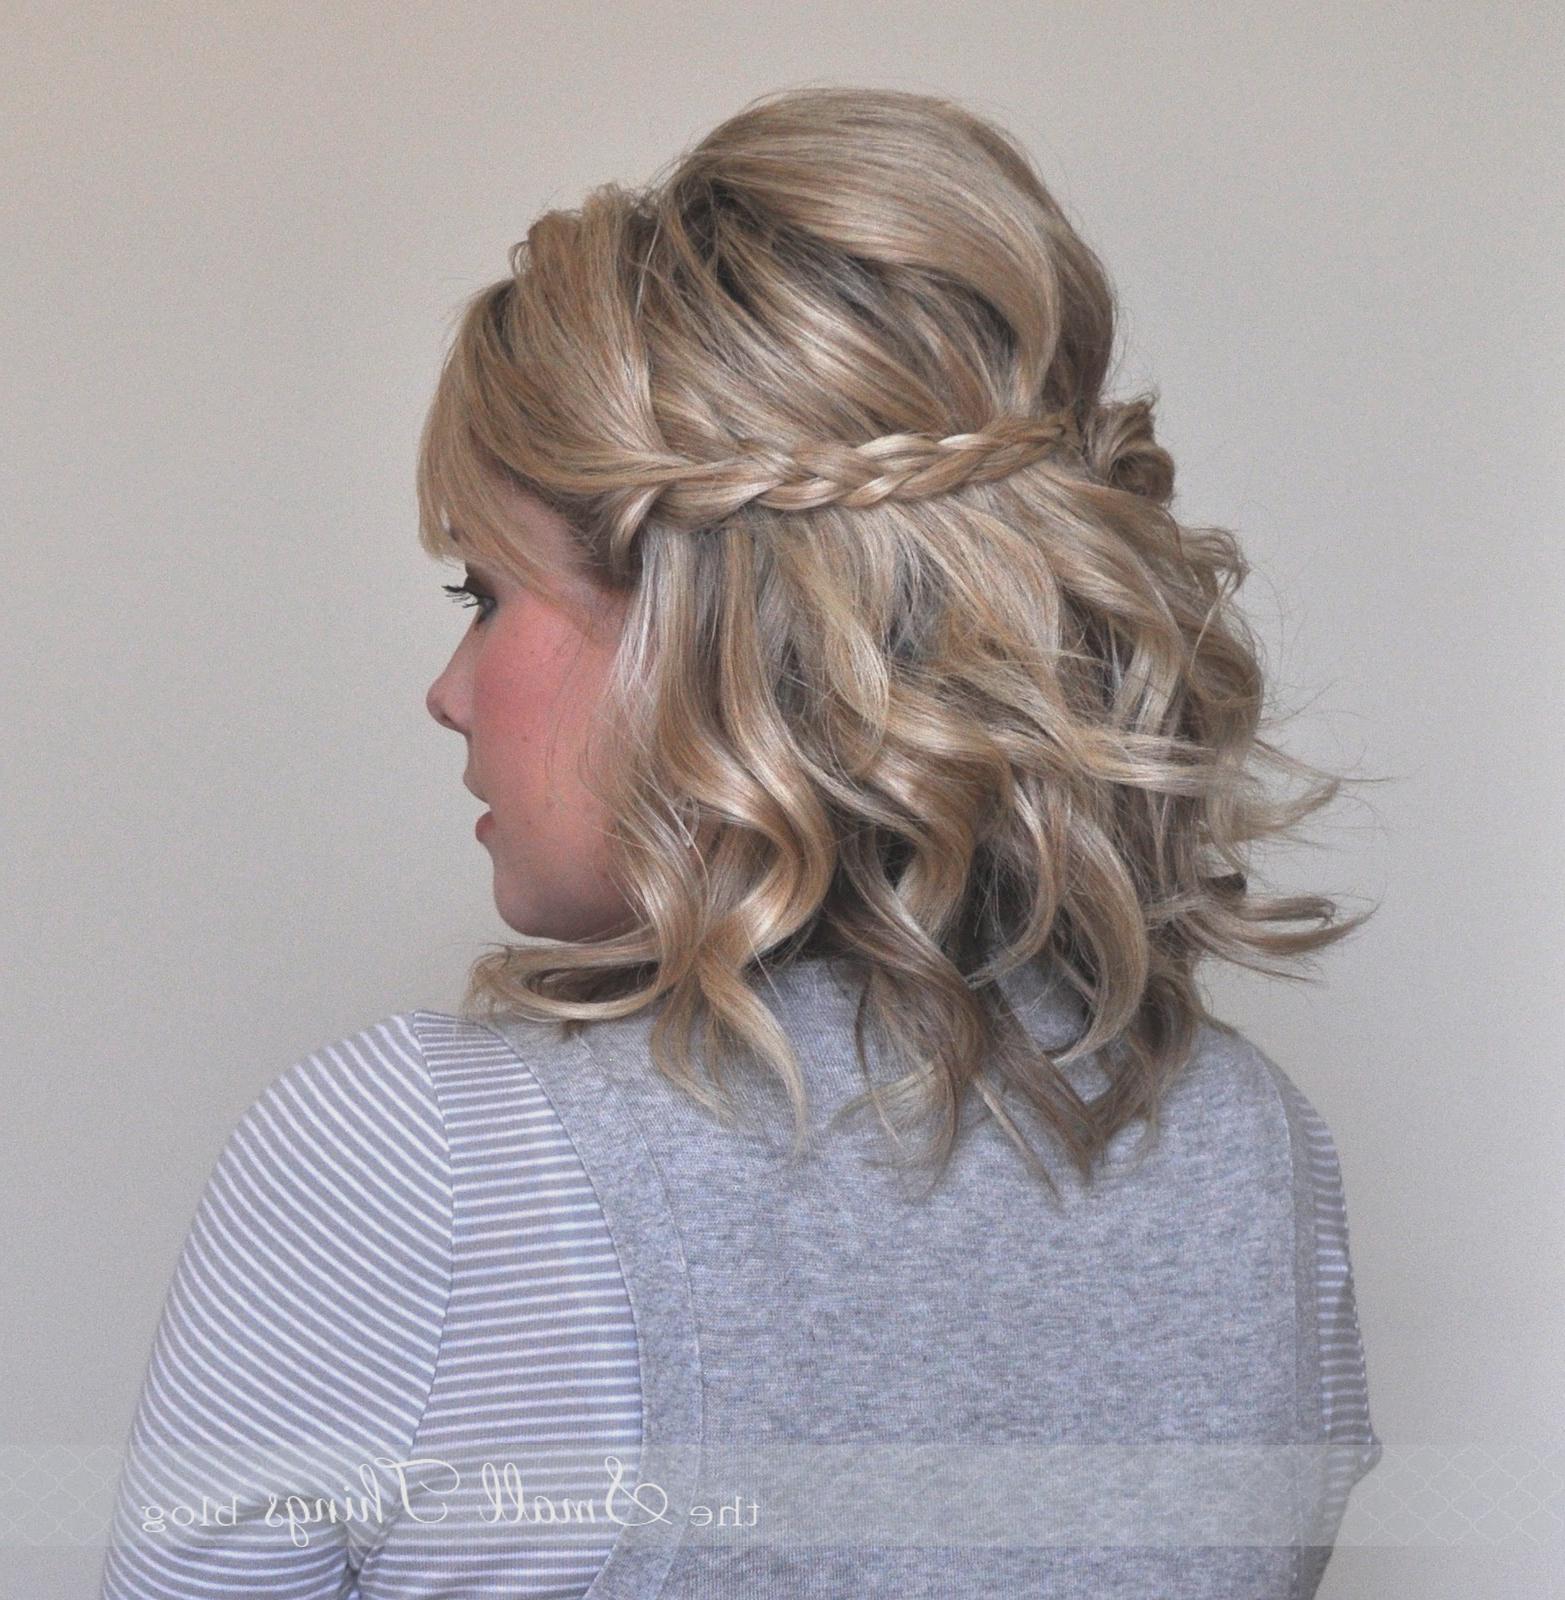 Wedding Hairstyles : Simple Wedding Hairstyles Half Up Short Hair Throughout Preferred Simple Halfdo Wedding Hairstyles For Short Hair (View 18 of 20)